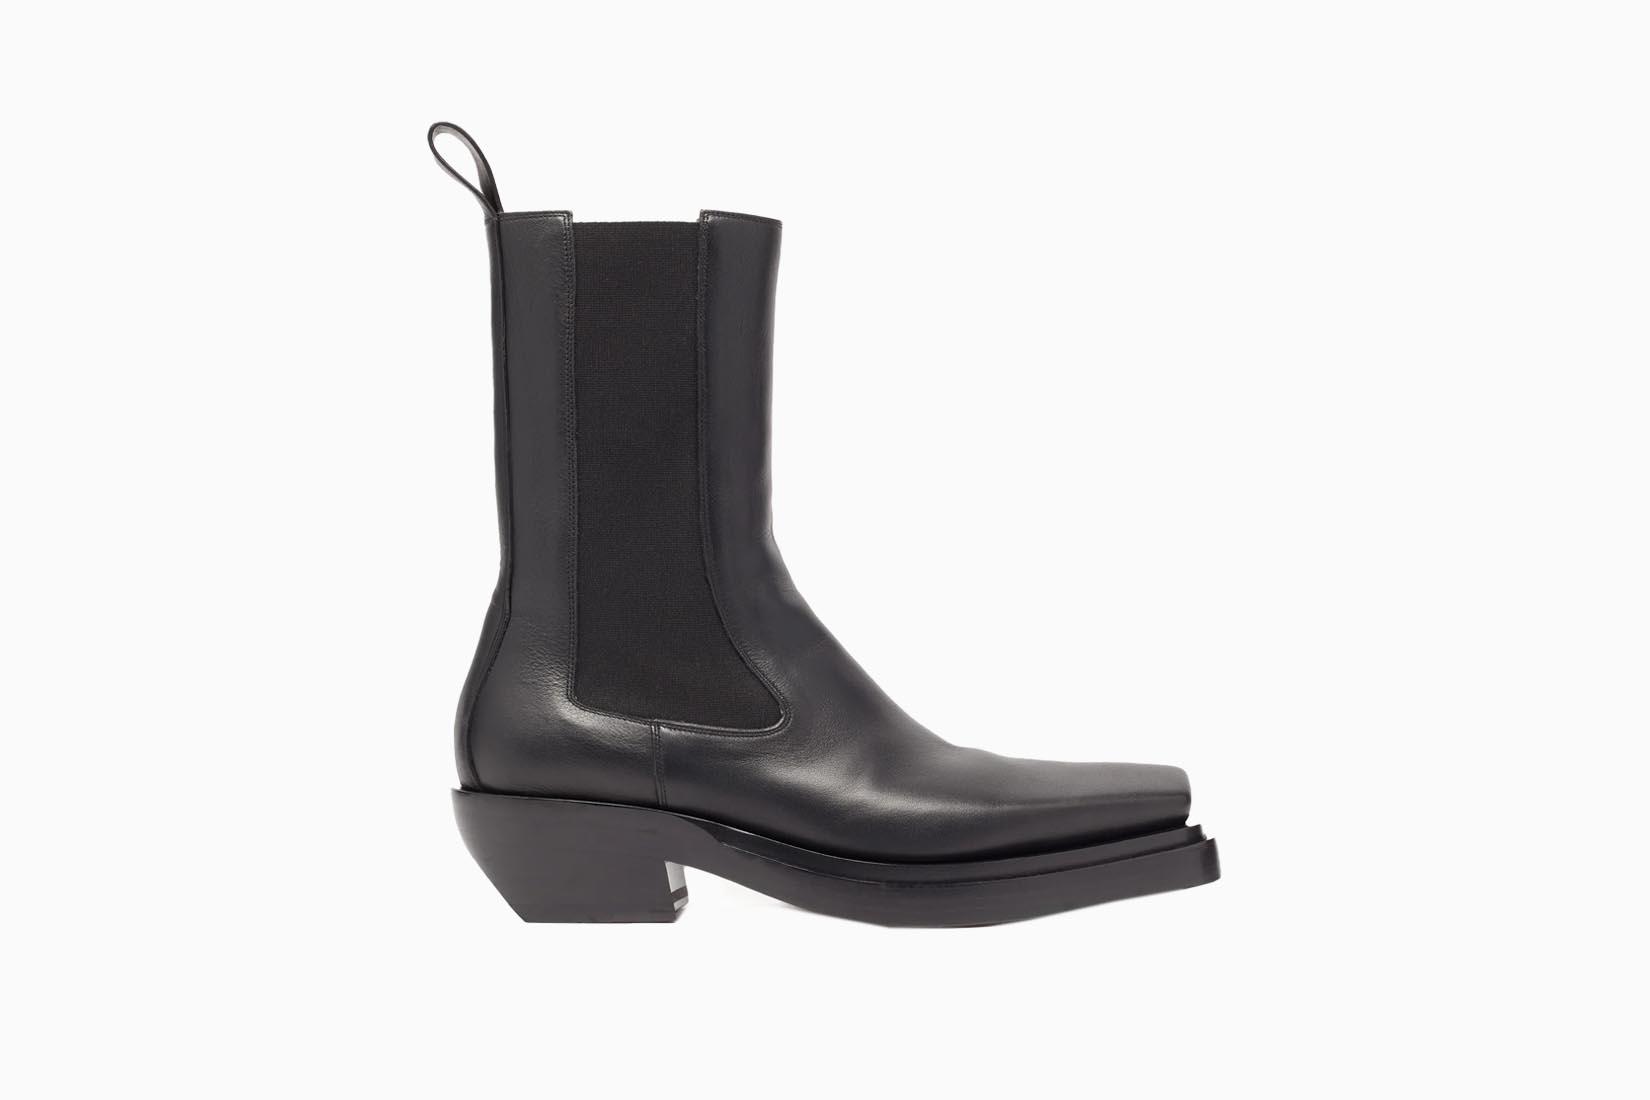 best boots men bottega veneta the lean boots review Luxe Digital